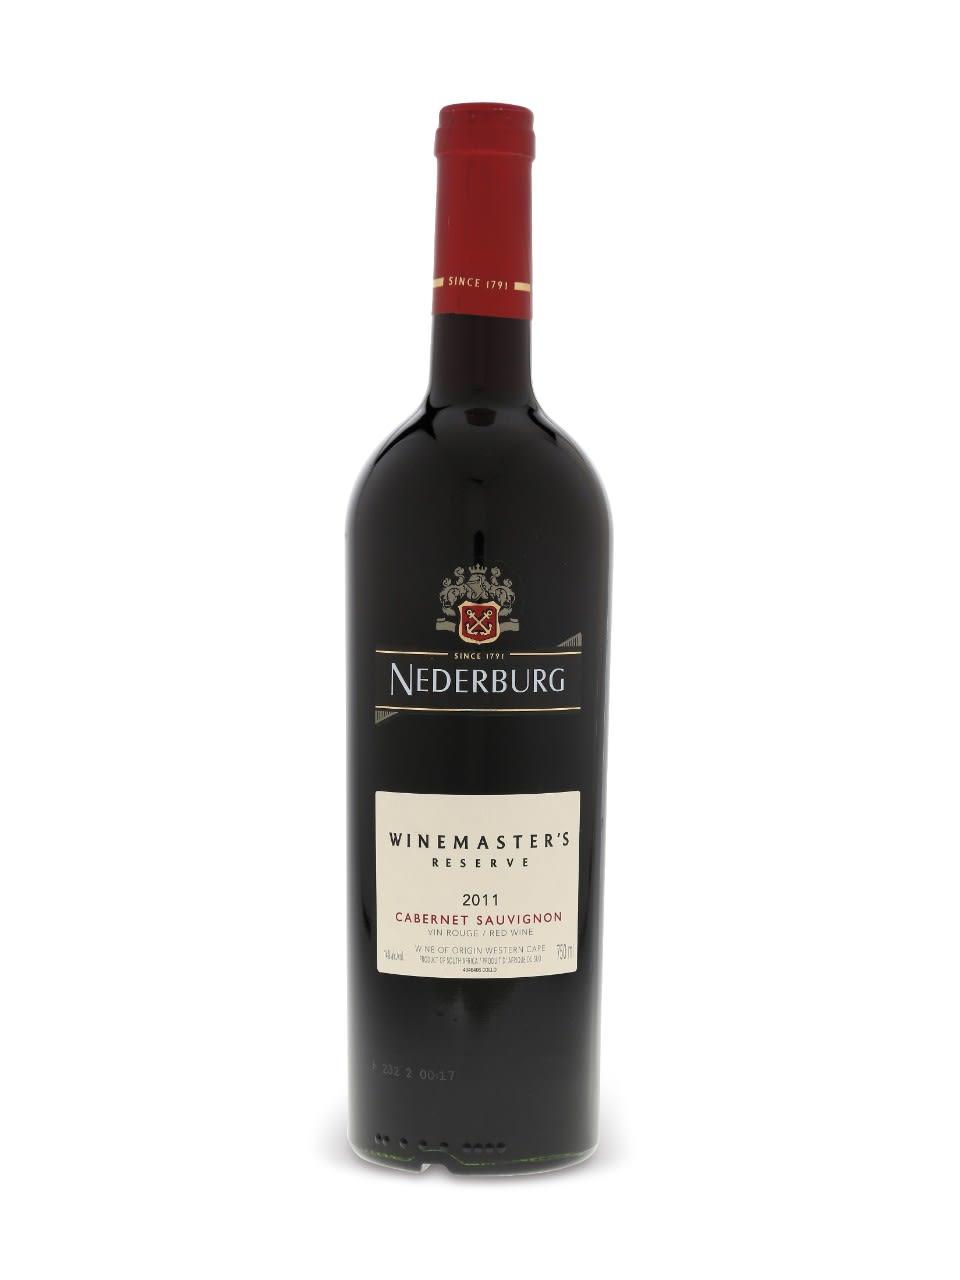 Nederburg Cabernet Sauvignon Red Wine 75cl, 14.5% acl. (Single Bottle).